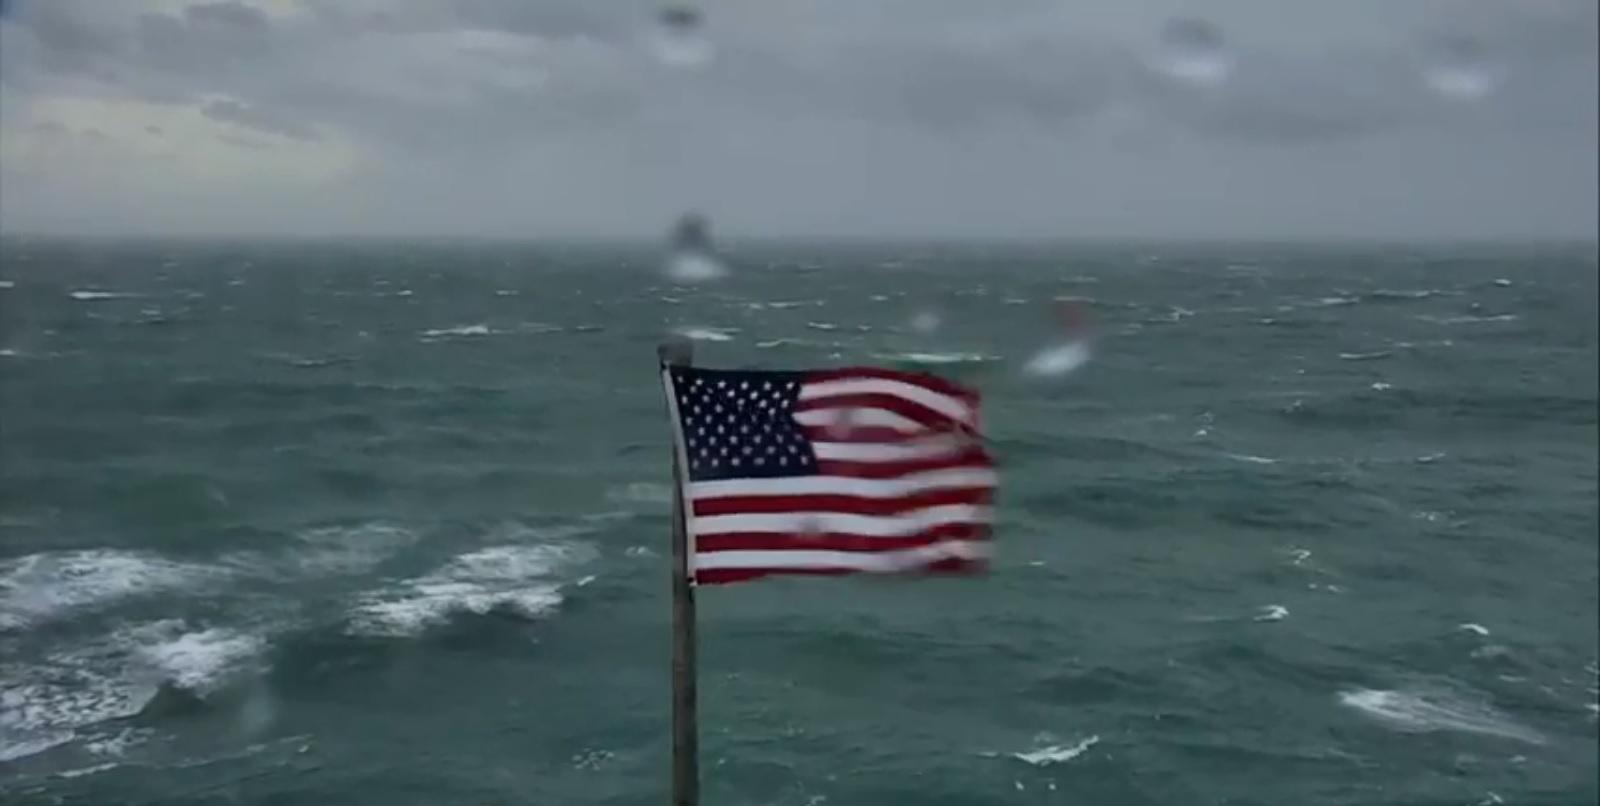 3 Live Cameras Show Hurricane Florence S Approach